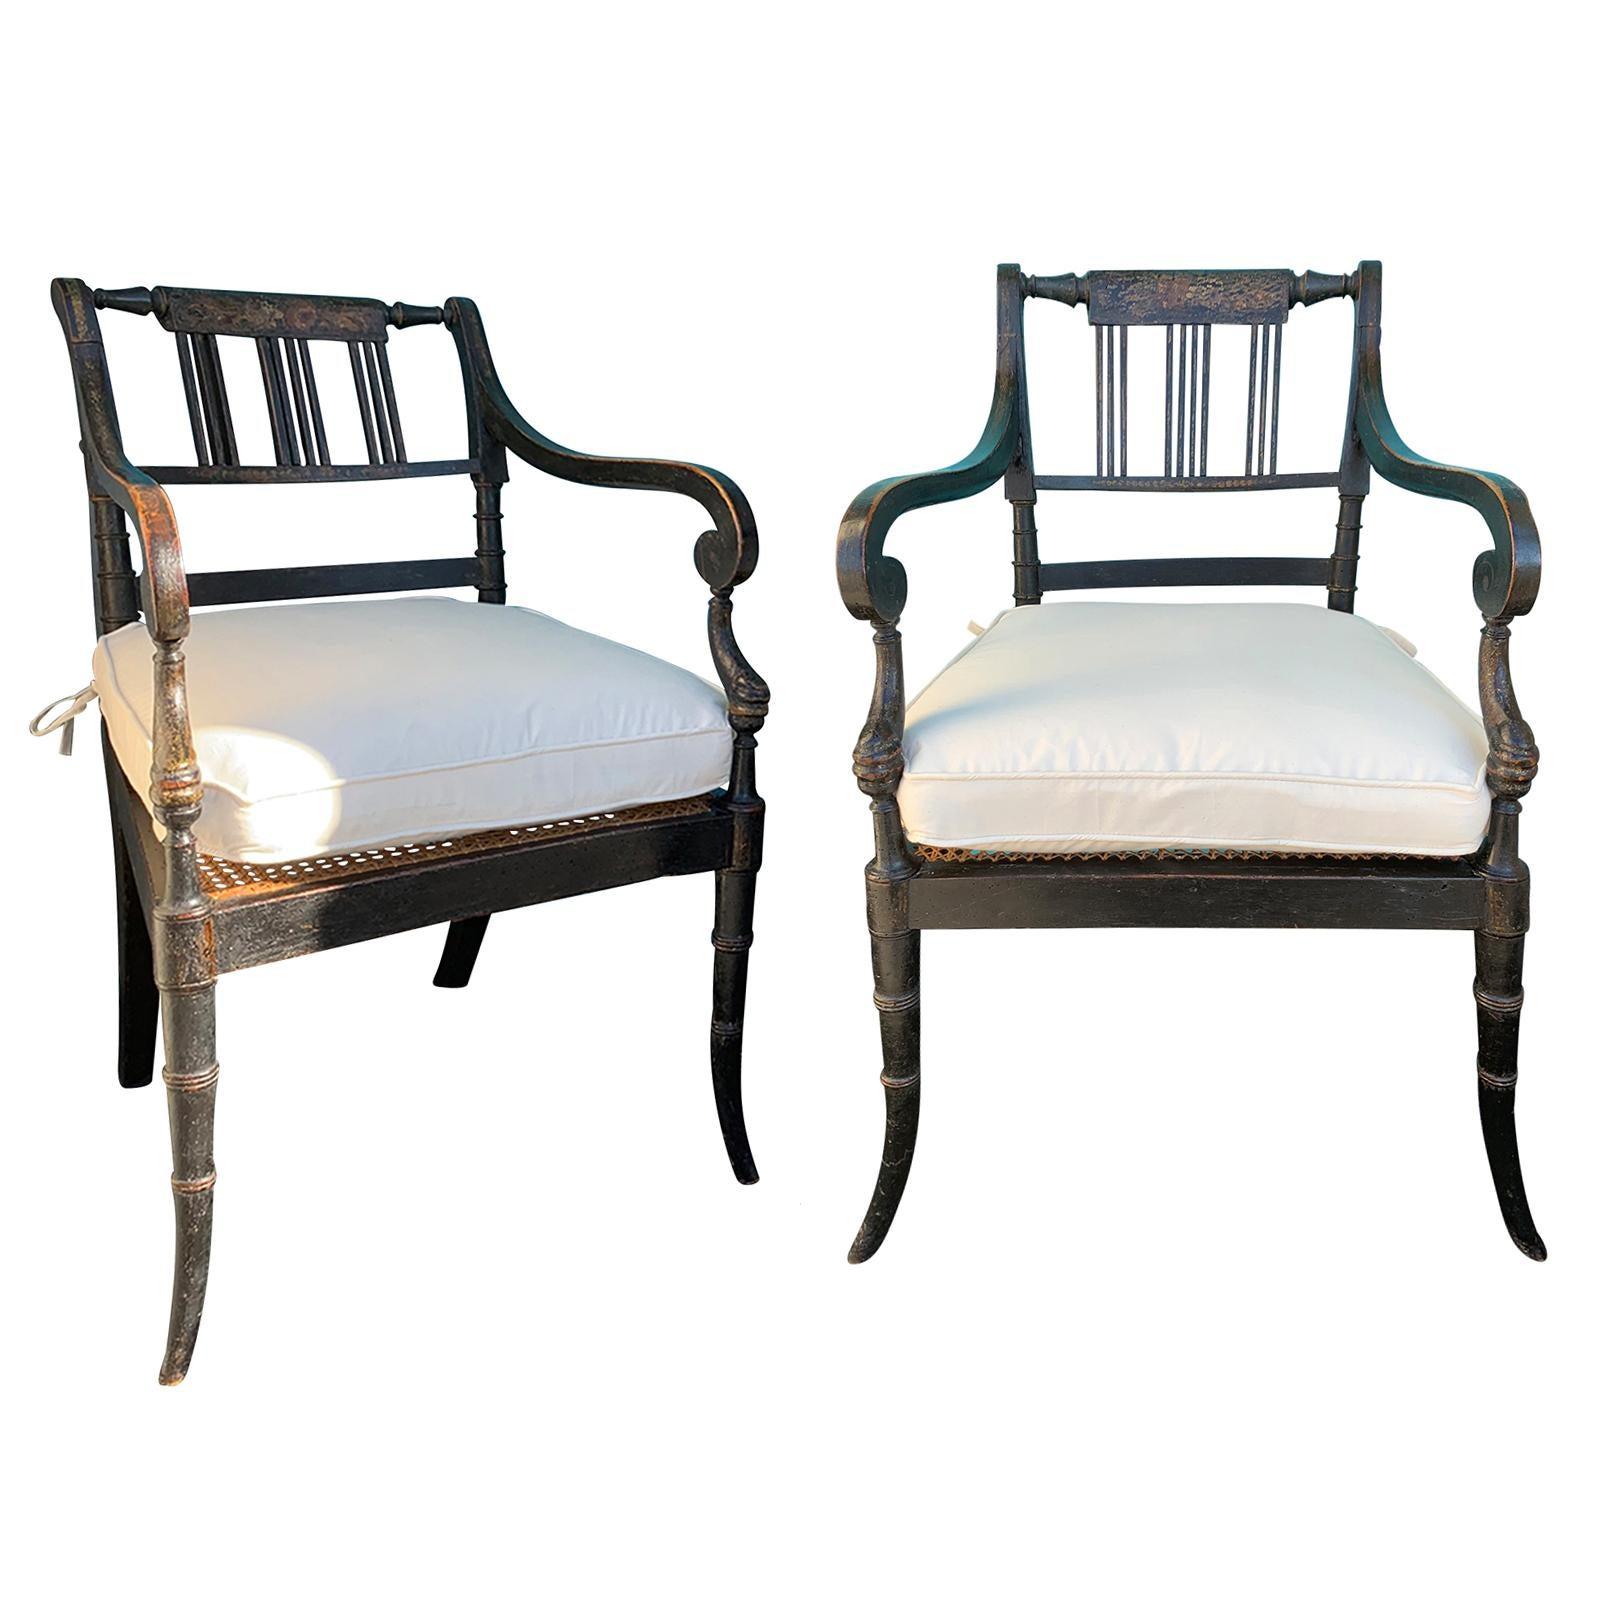 Pair of English Regency Armchairs, circa 1815-1830